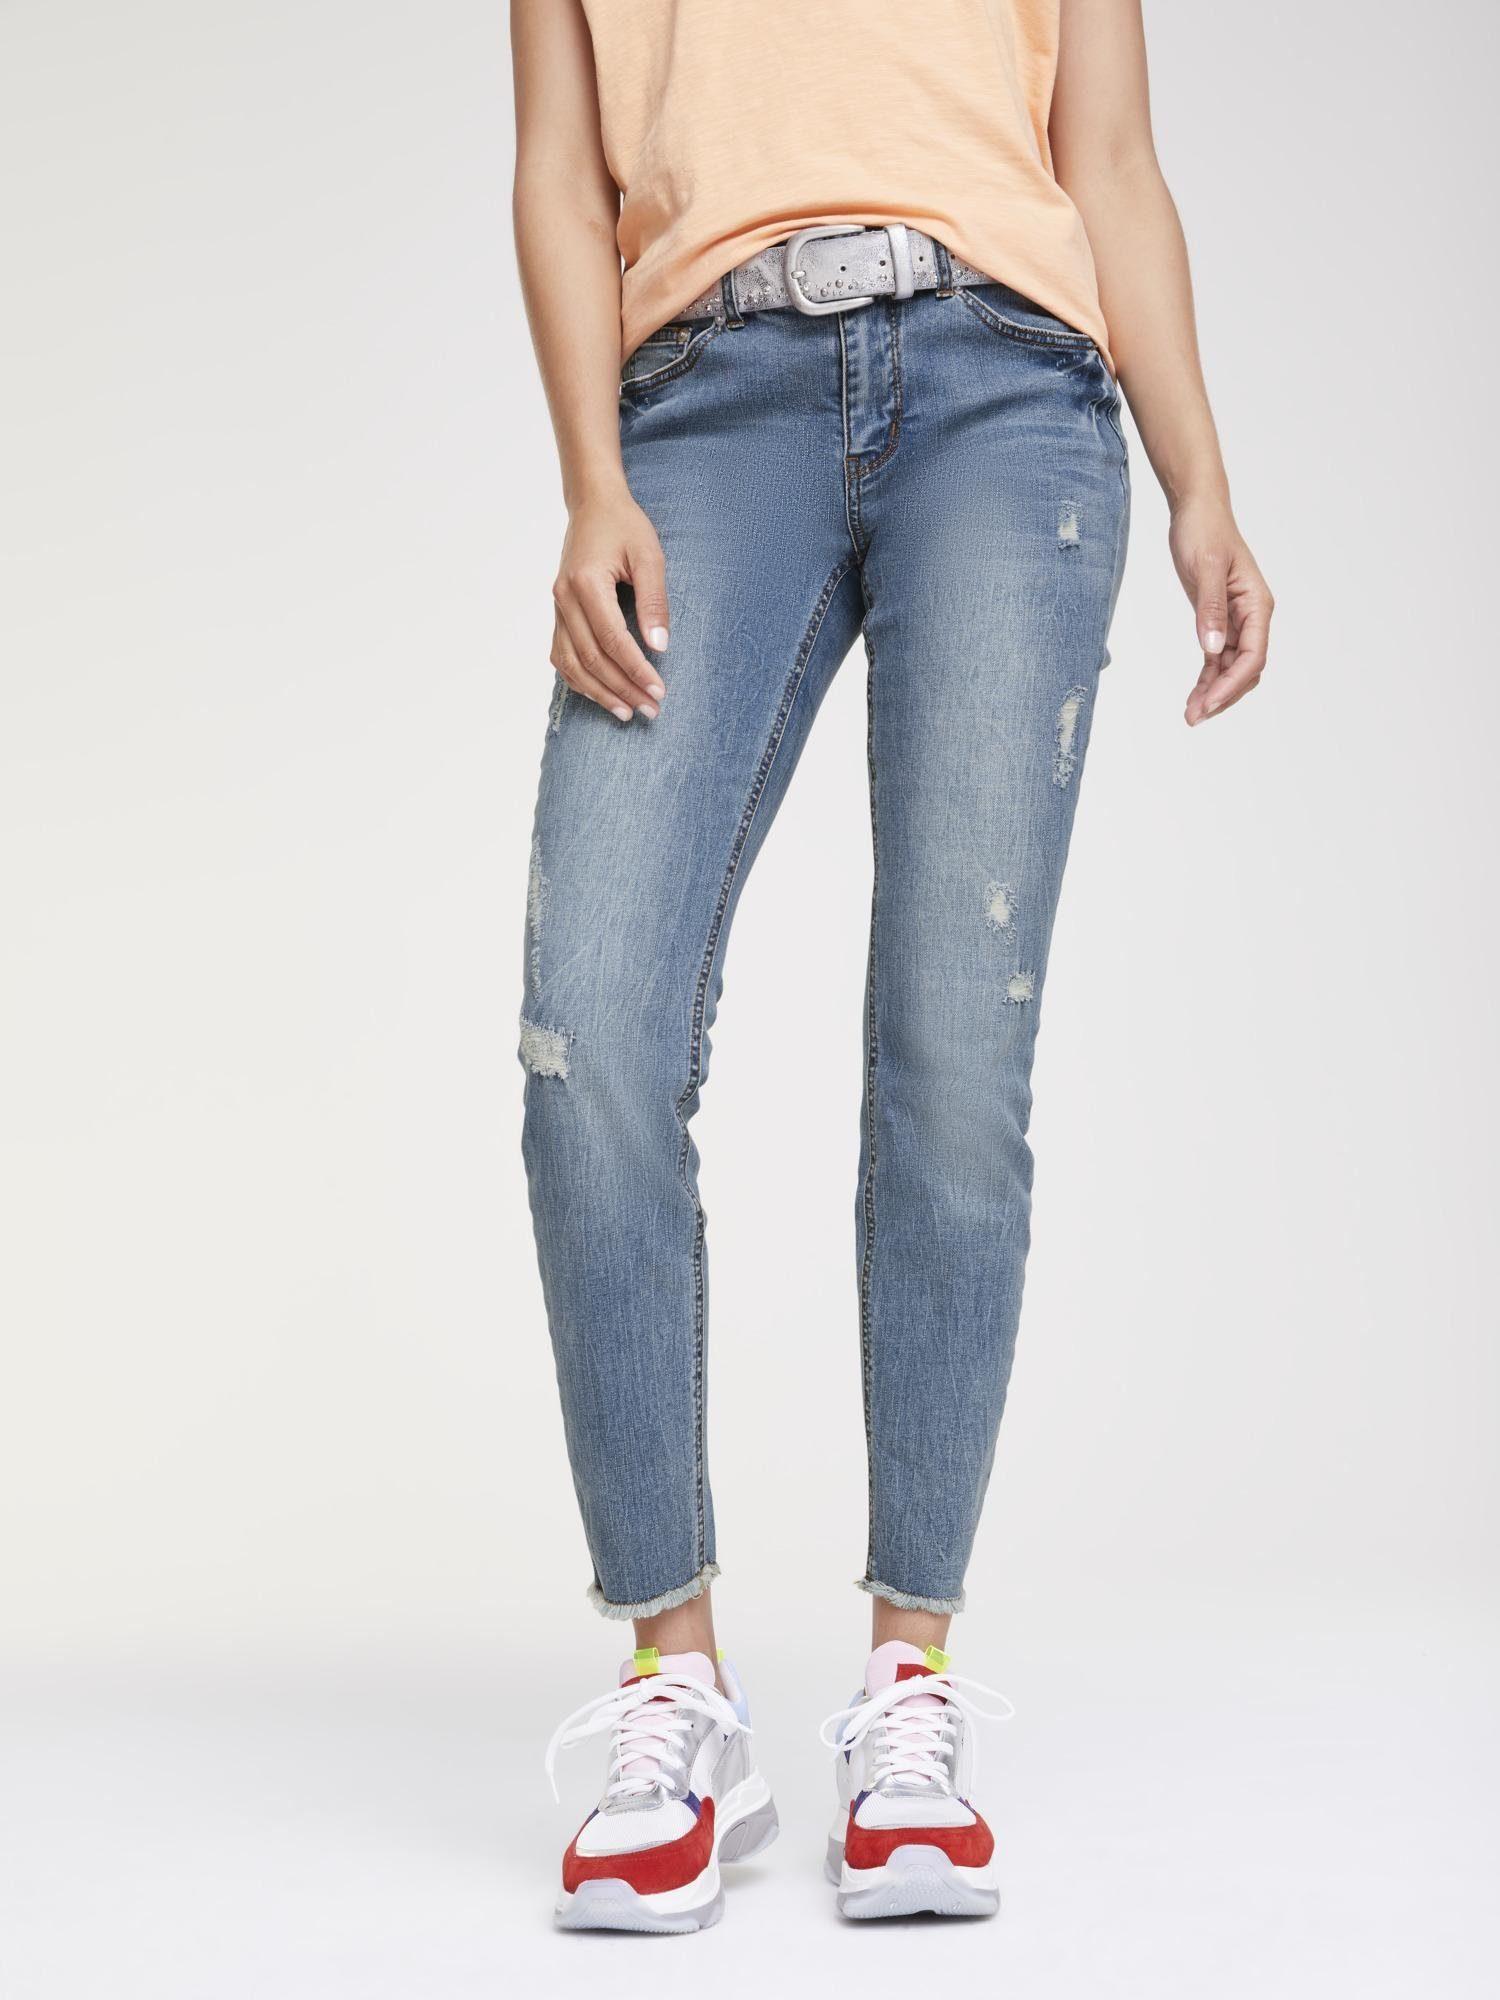 LINEA TESINI by Heine heine CASUAL Jeans Aleria im Used Look, Angesagte Skinny Form online kaufen | OTTO